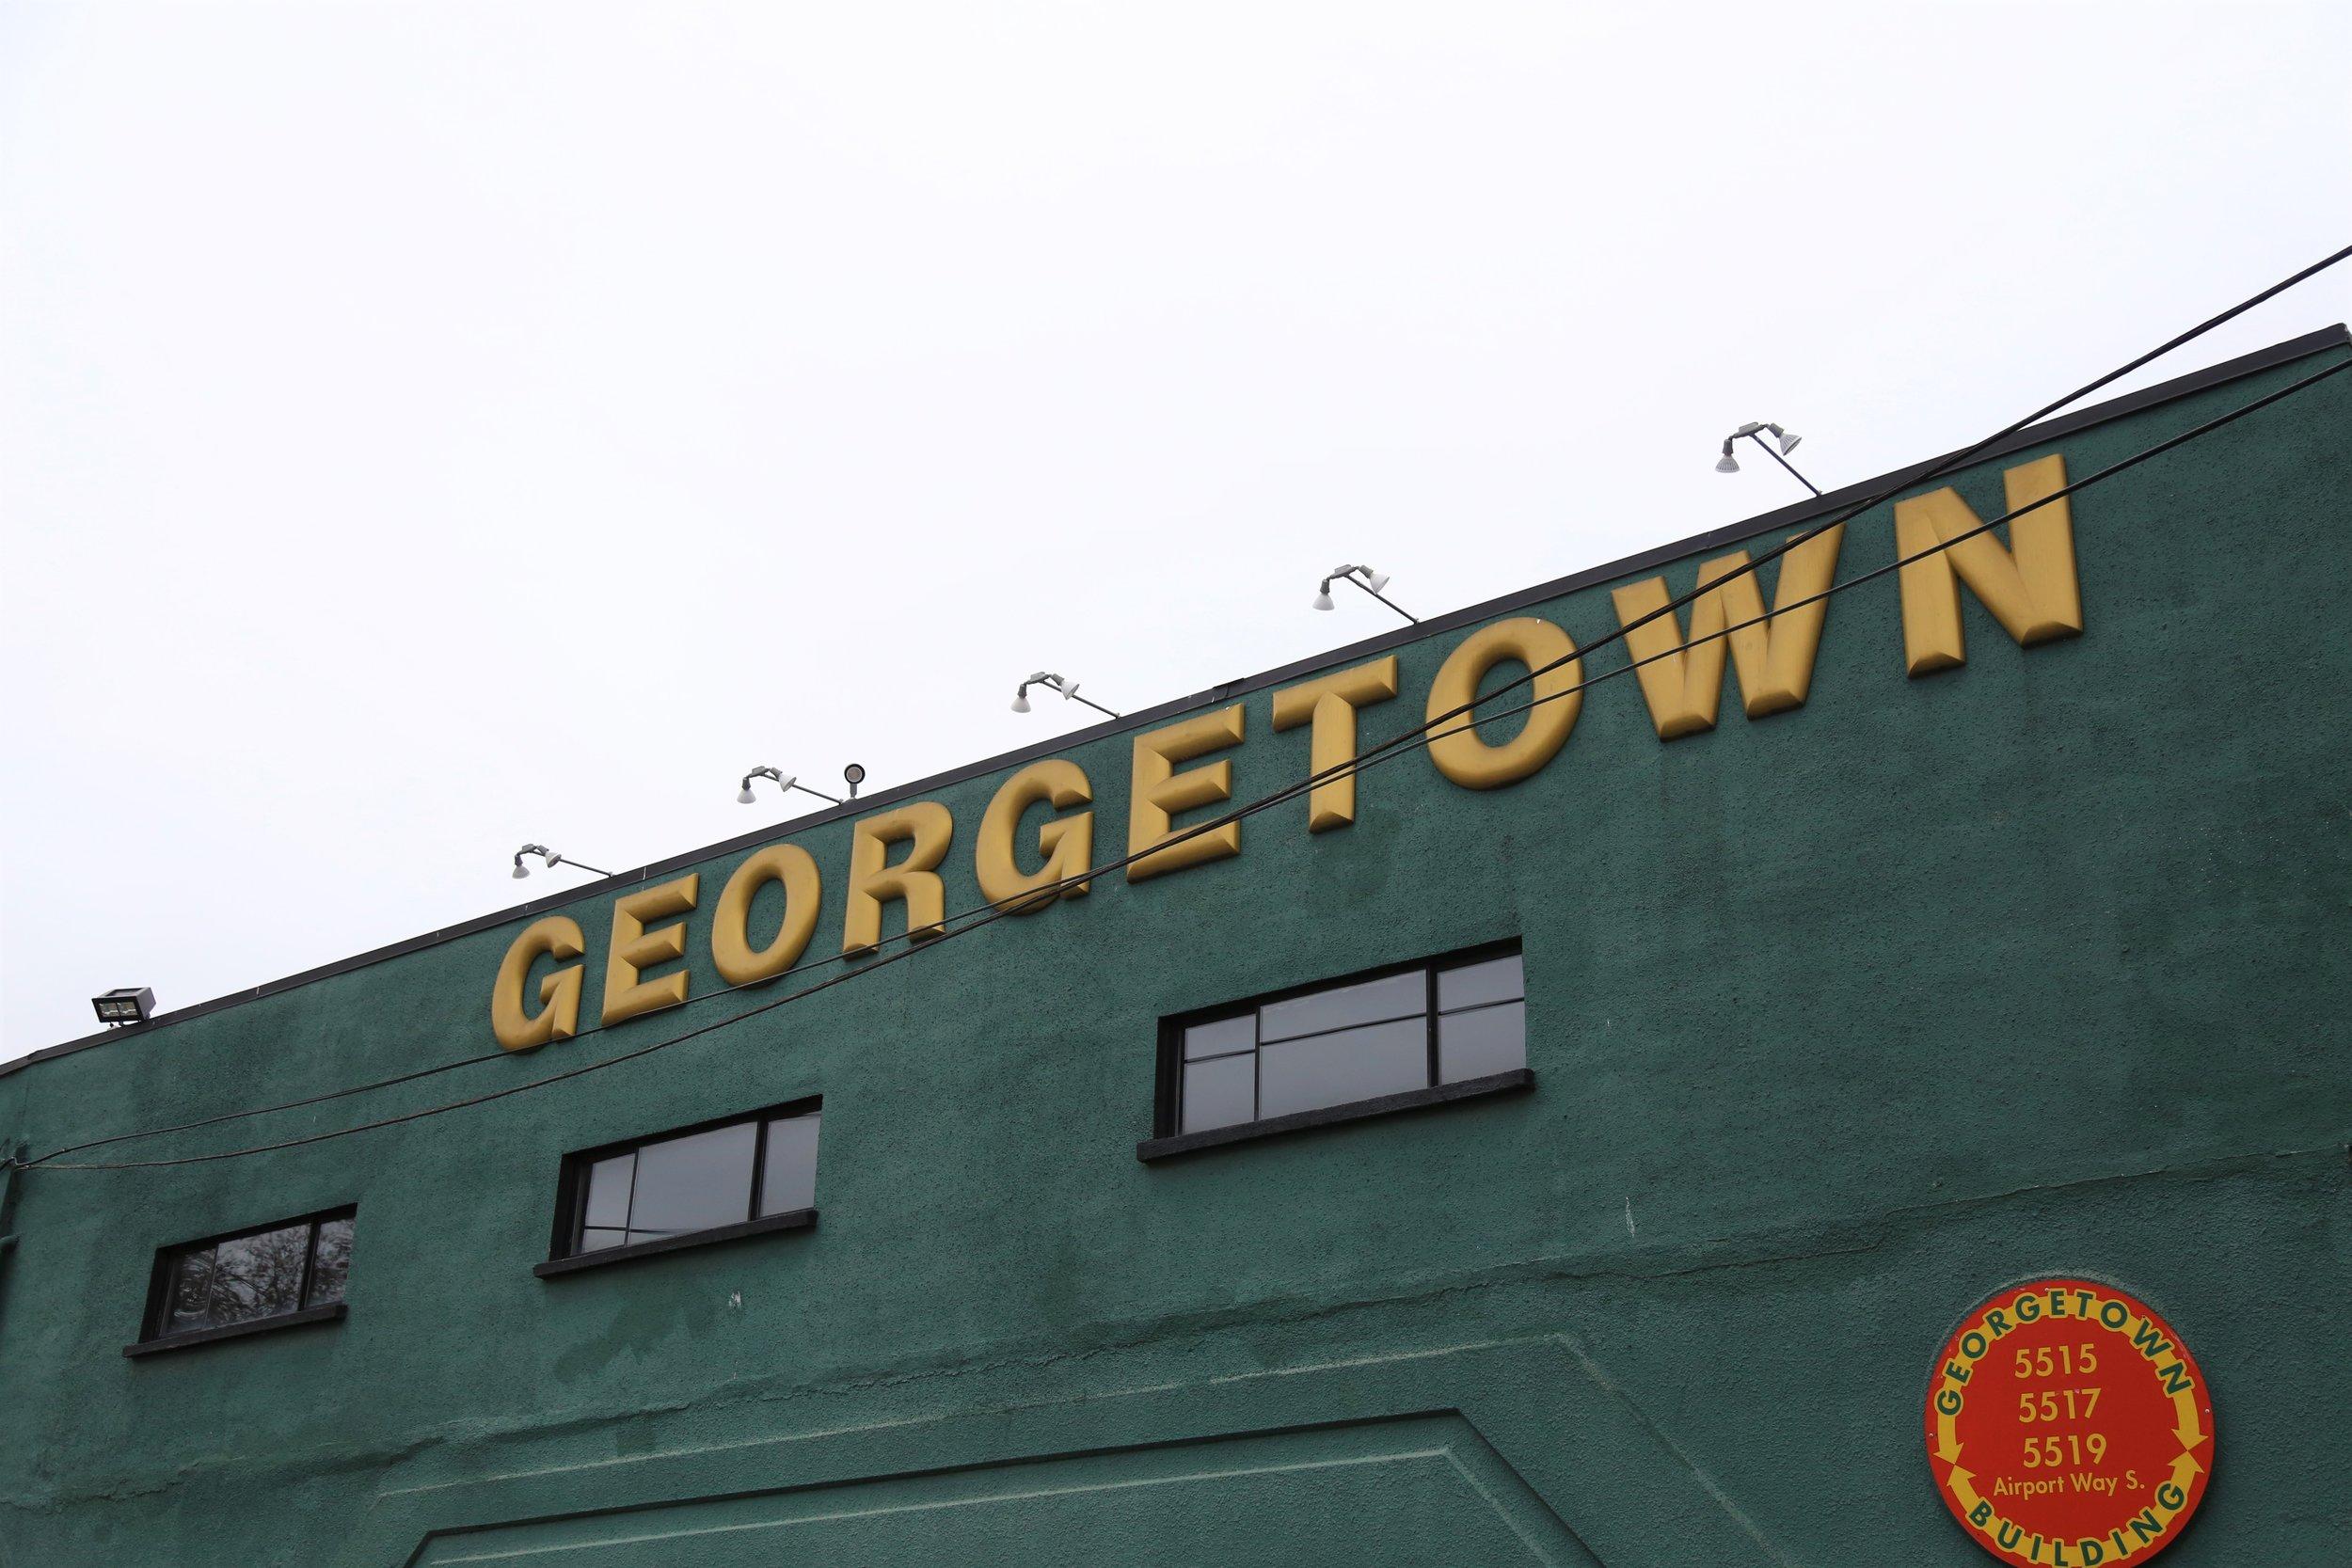 Seattle's Georgetown